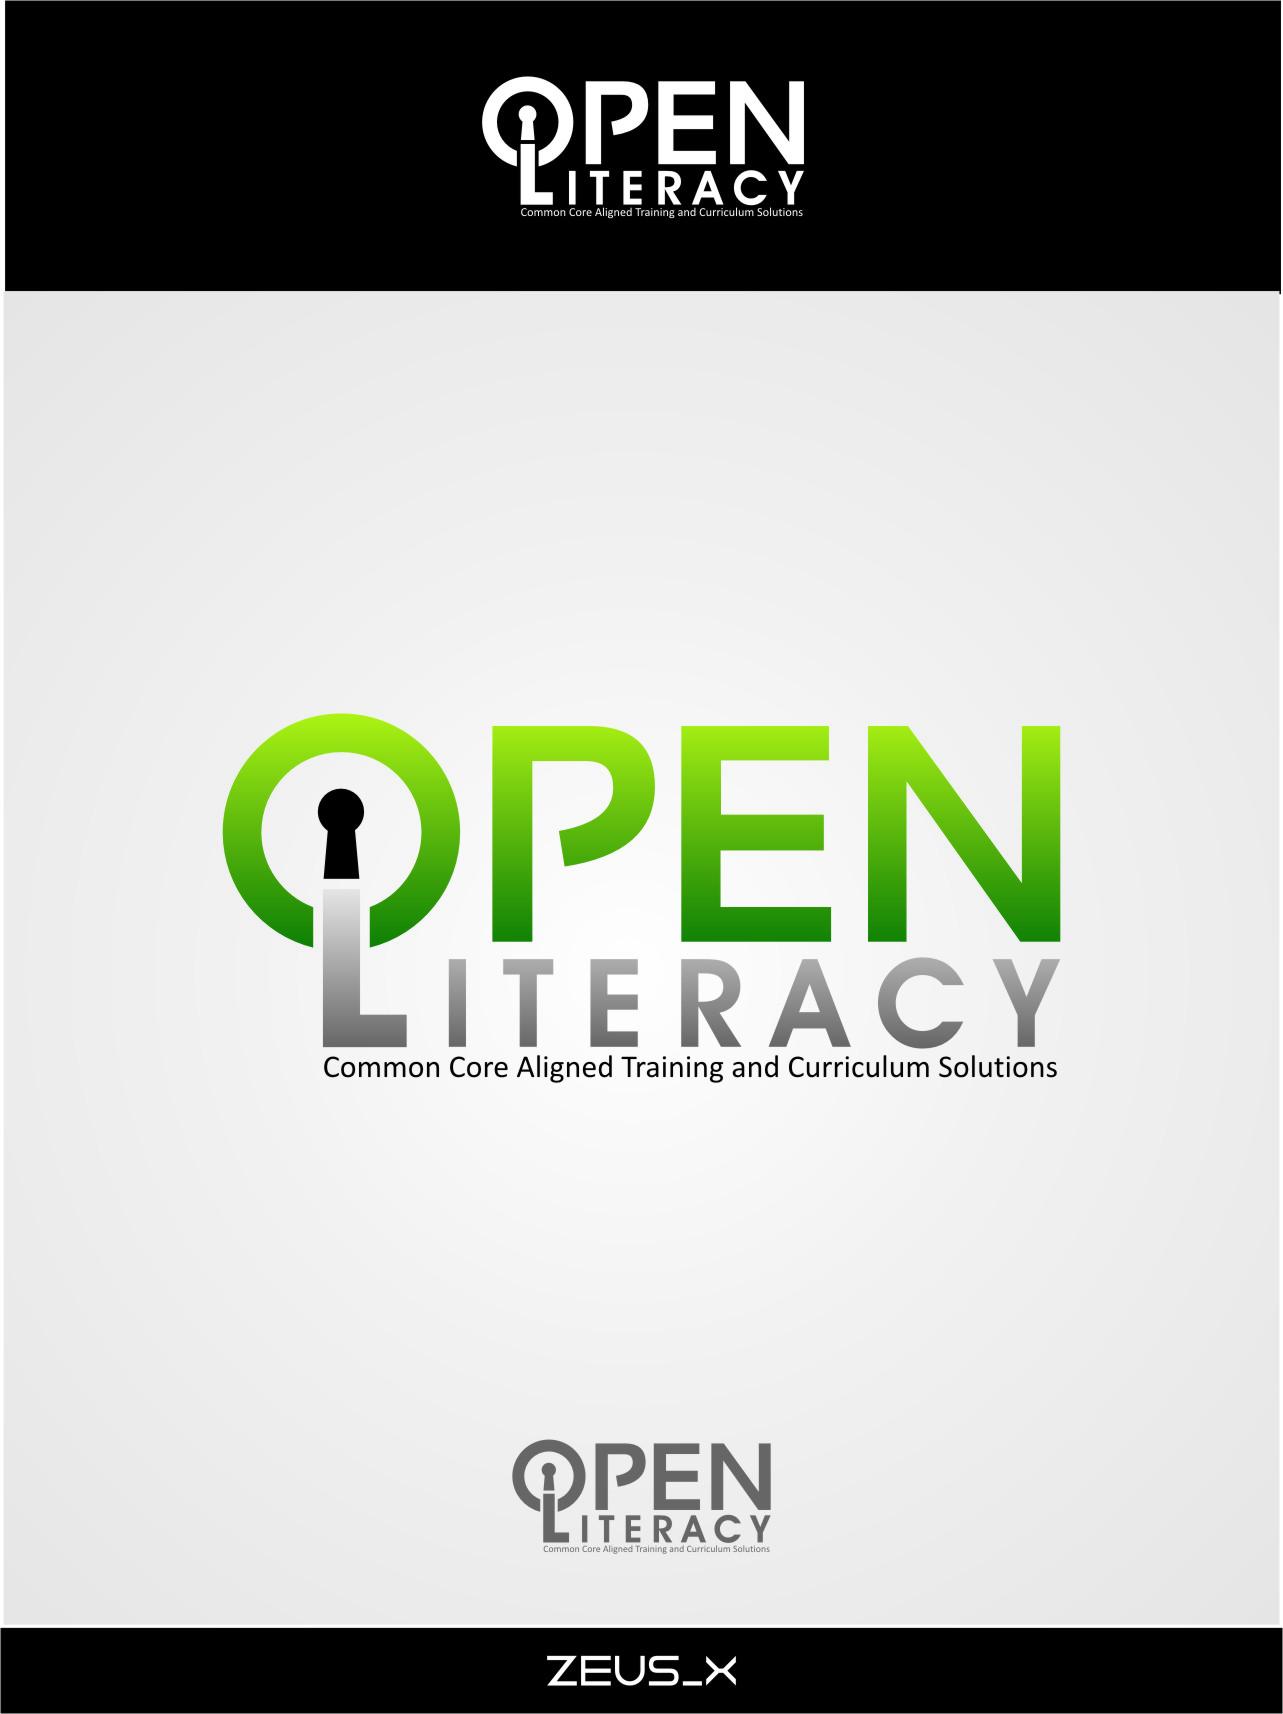 Logo Design by Ngepet_art - Entry No. 120 in the Logo Design Contest Inspiring Logo Design for OpenLiteracy.